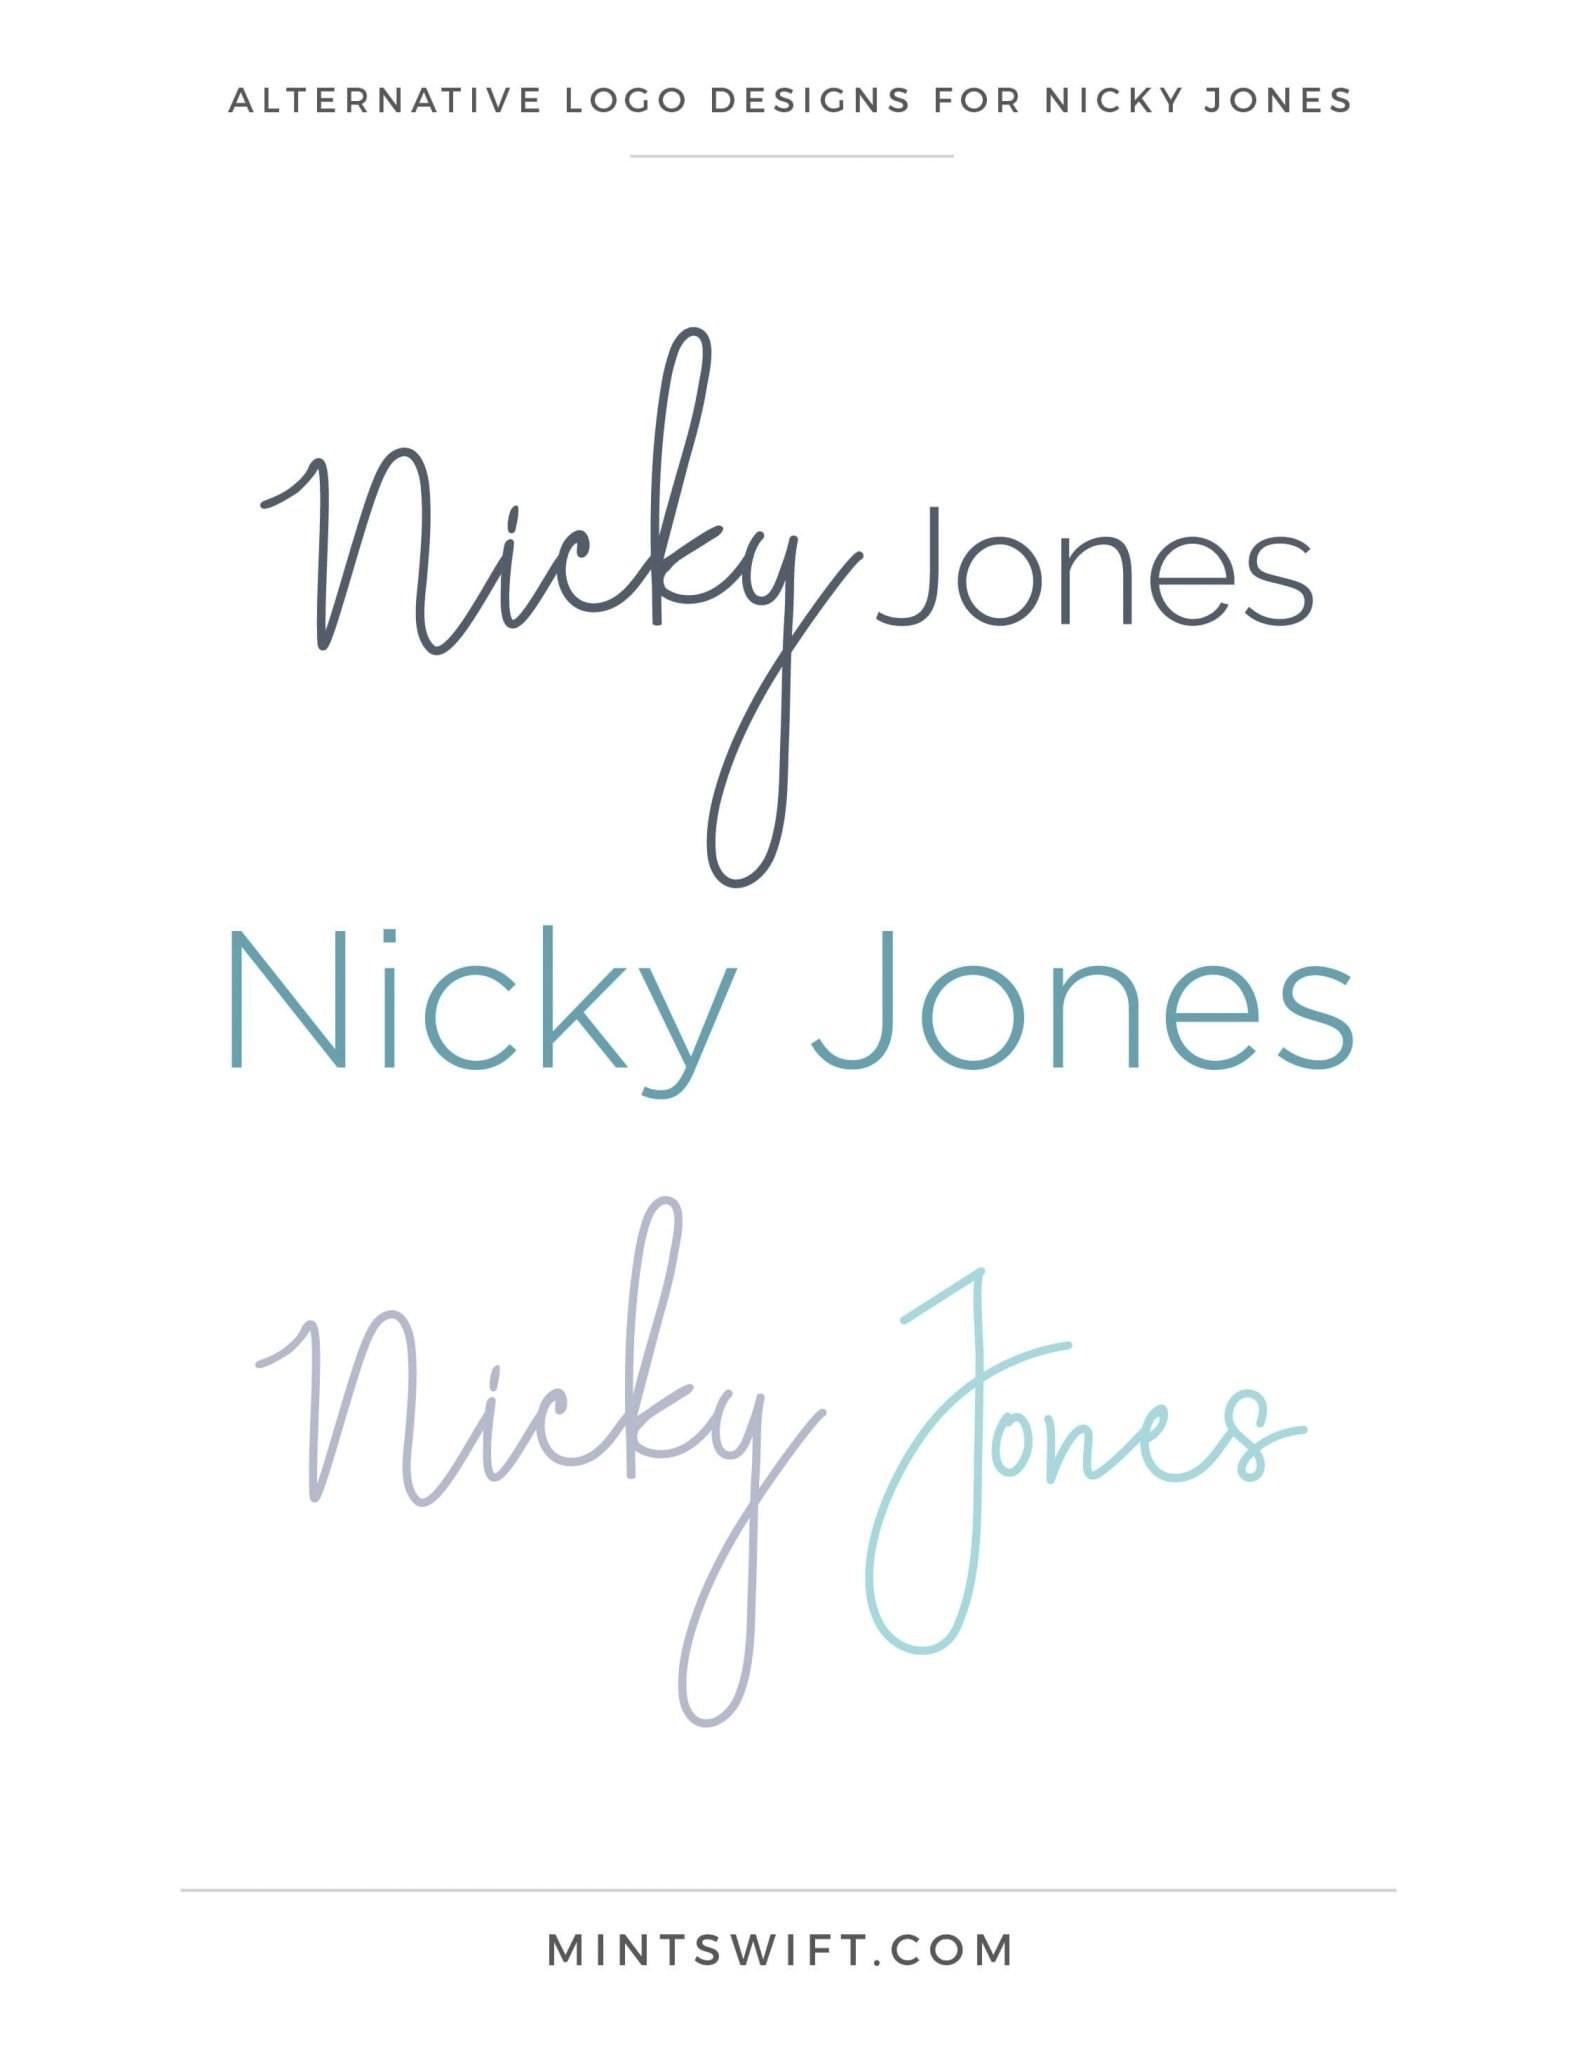 Nicky Jones - Alternative Logo Designs - Brand Design Package - MintSwift